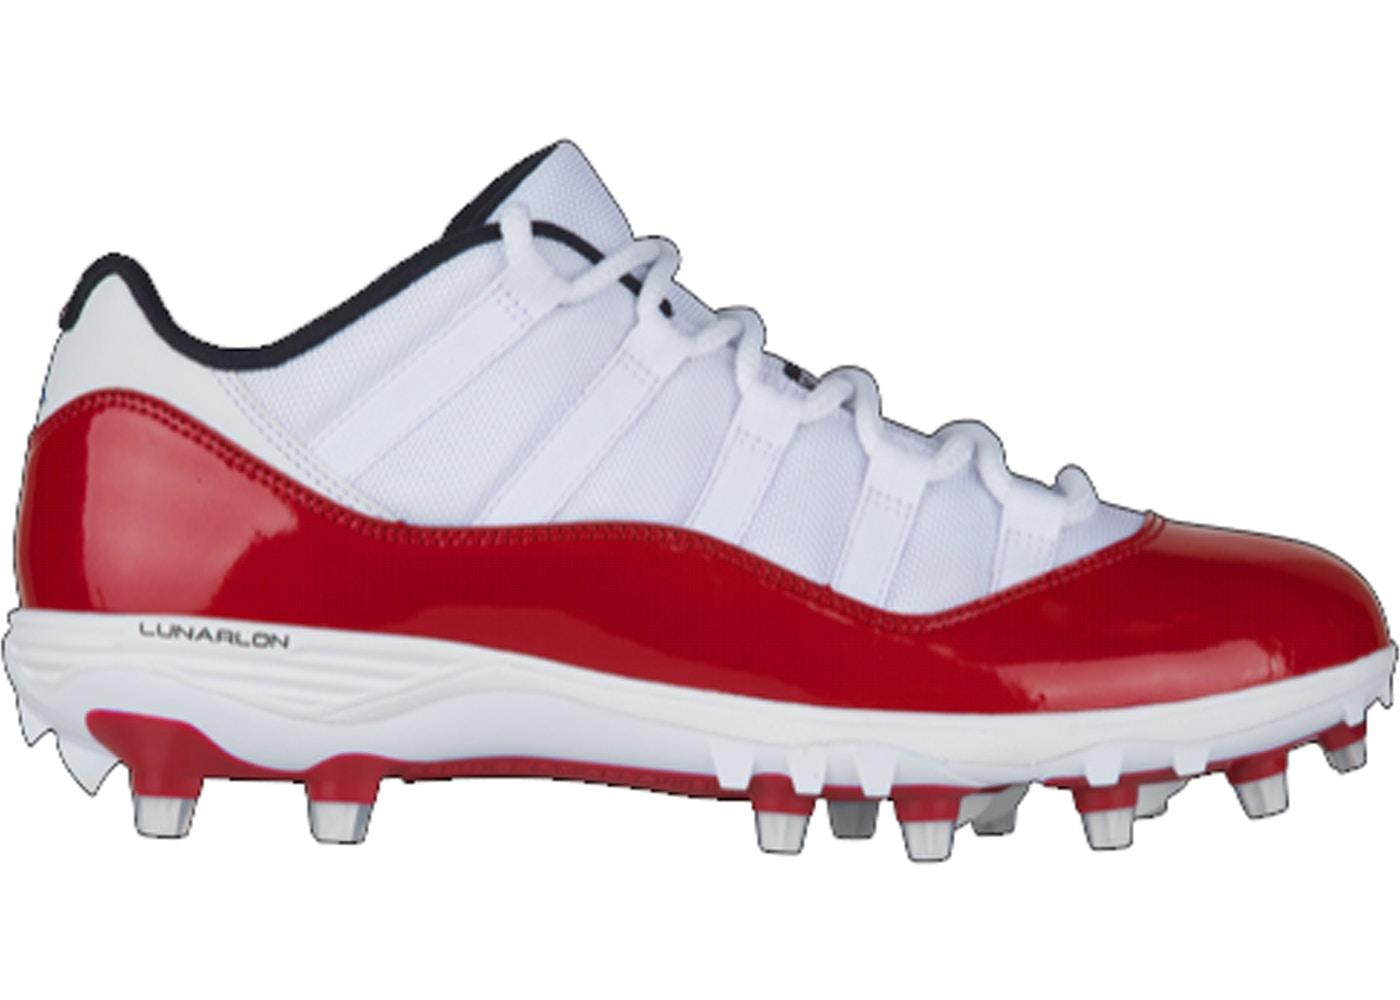 f0daa1b462b75 Air Jordan 11 Size 16 Shoes - Average Sale Price